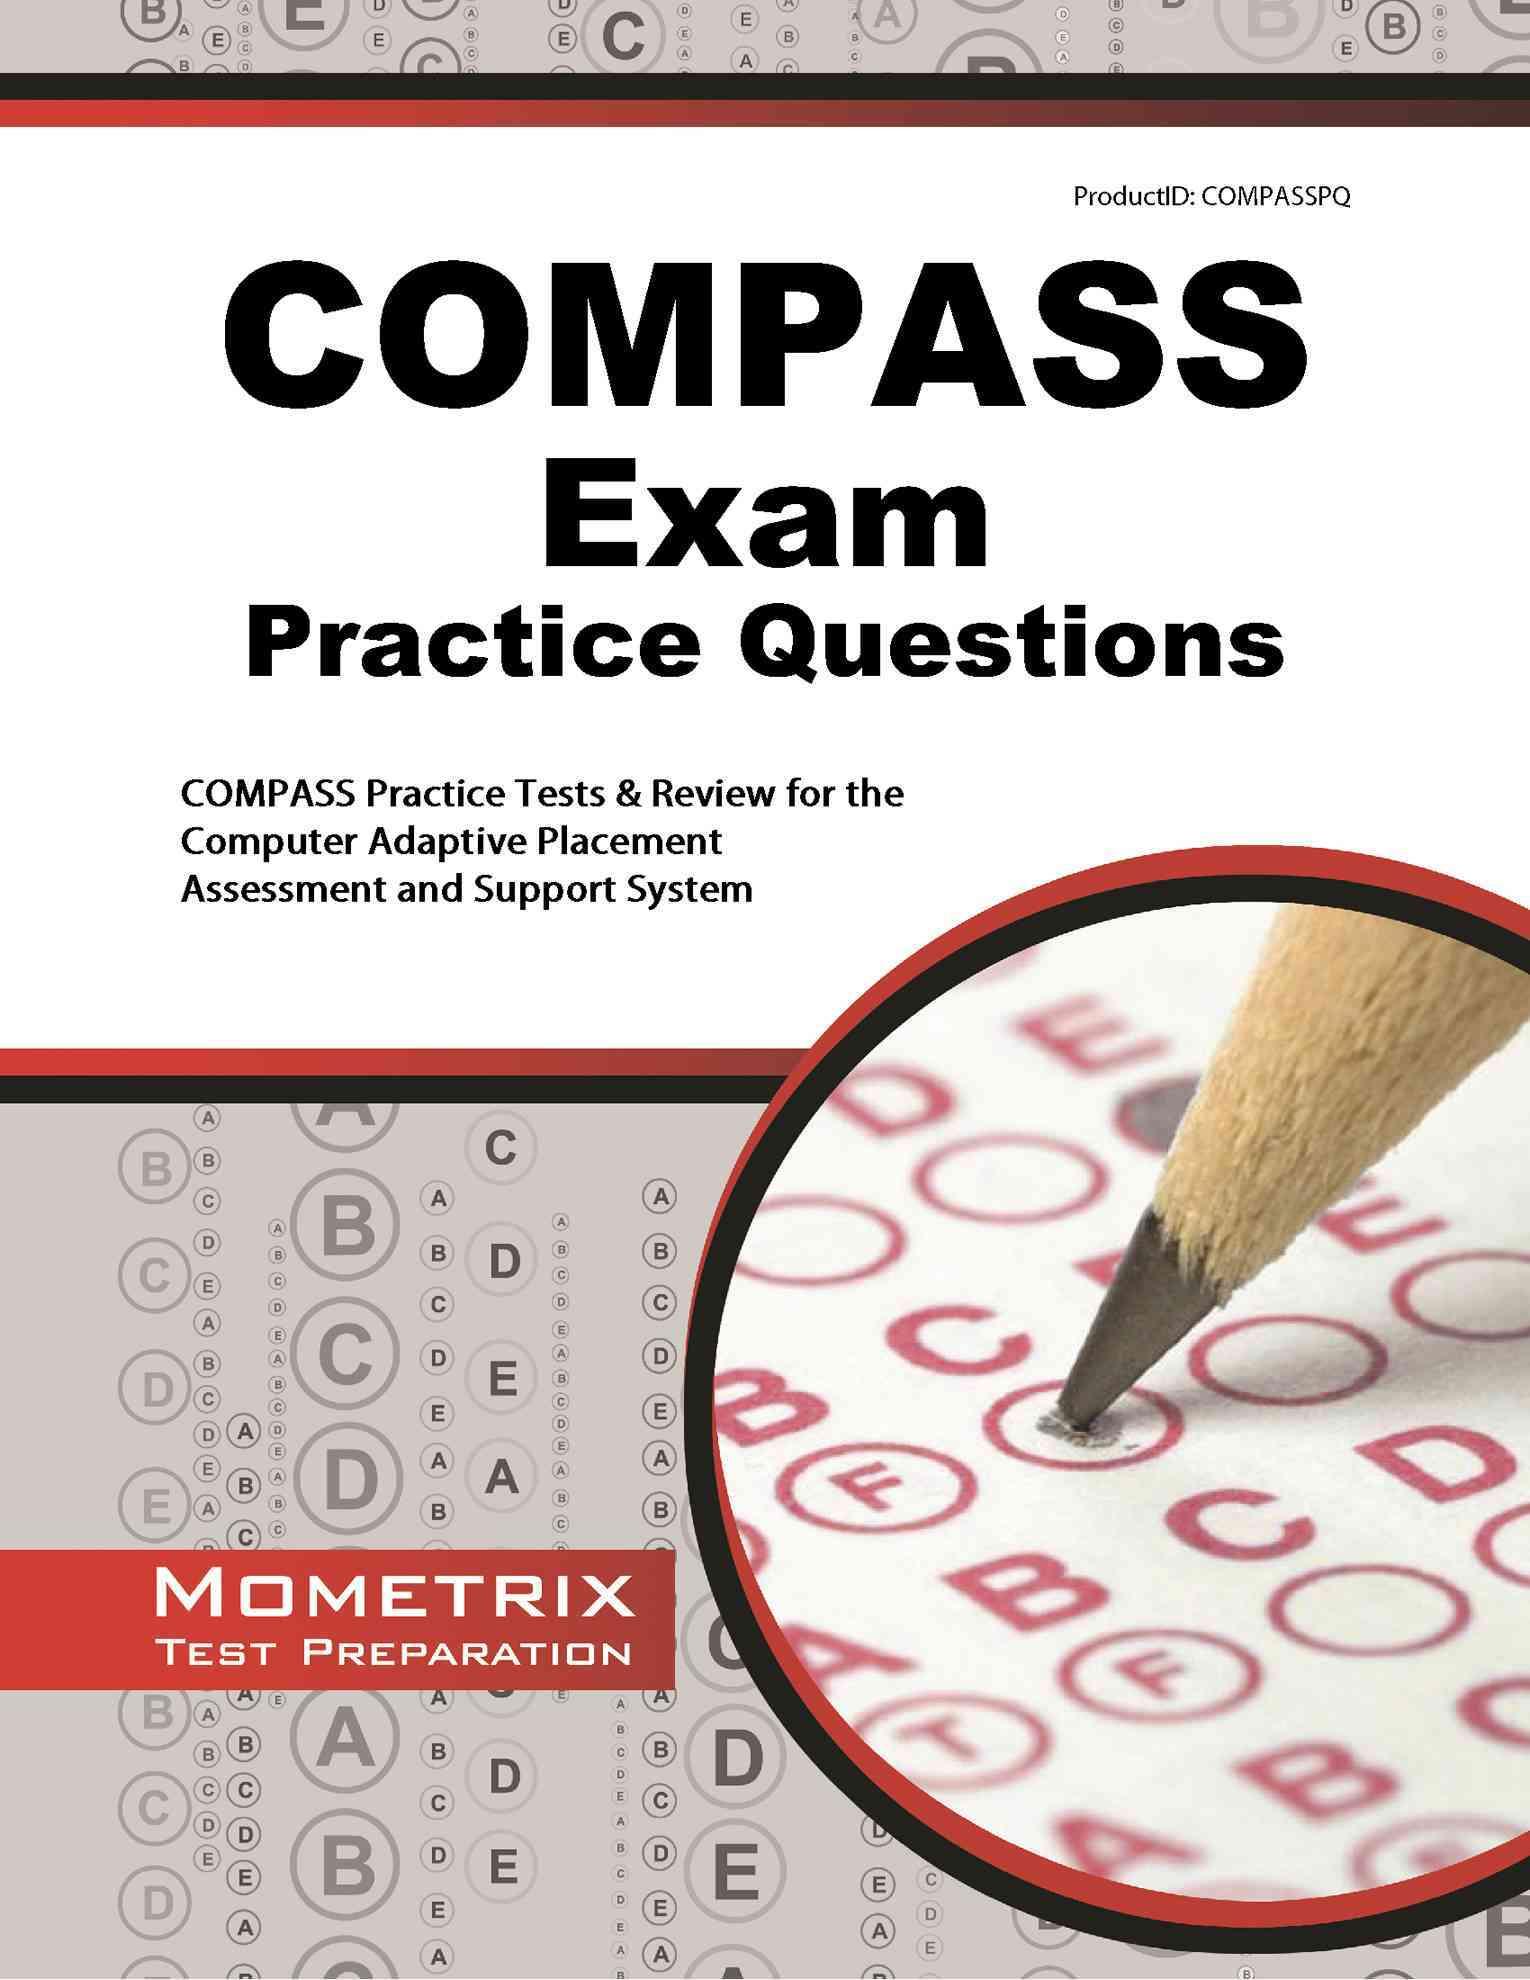 Compass Exam Practice Questions By Compass Exam Secrets Team (EDT)